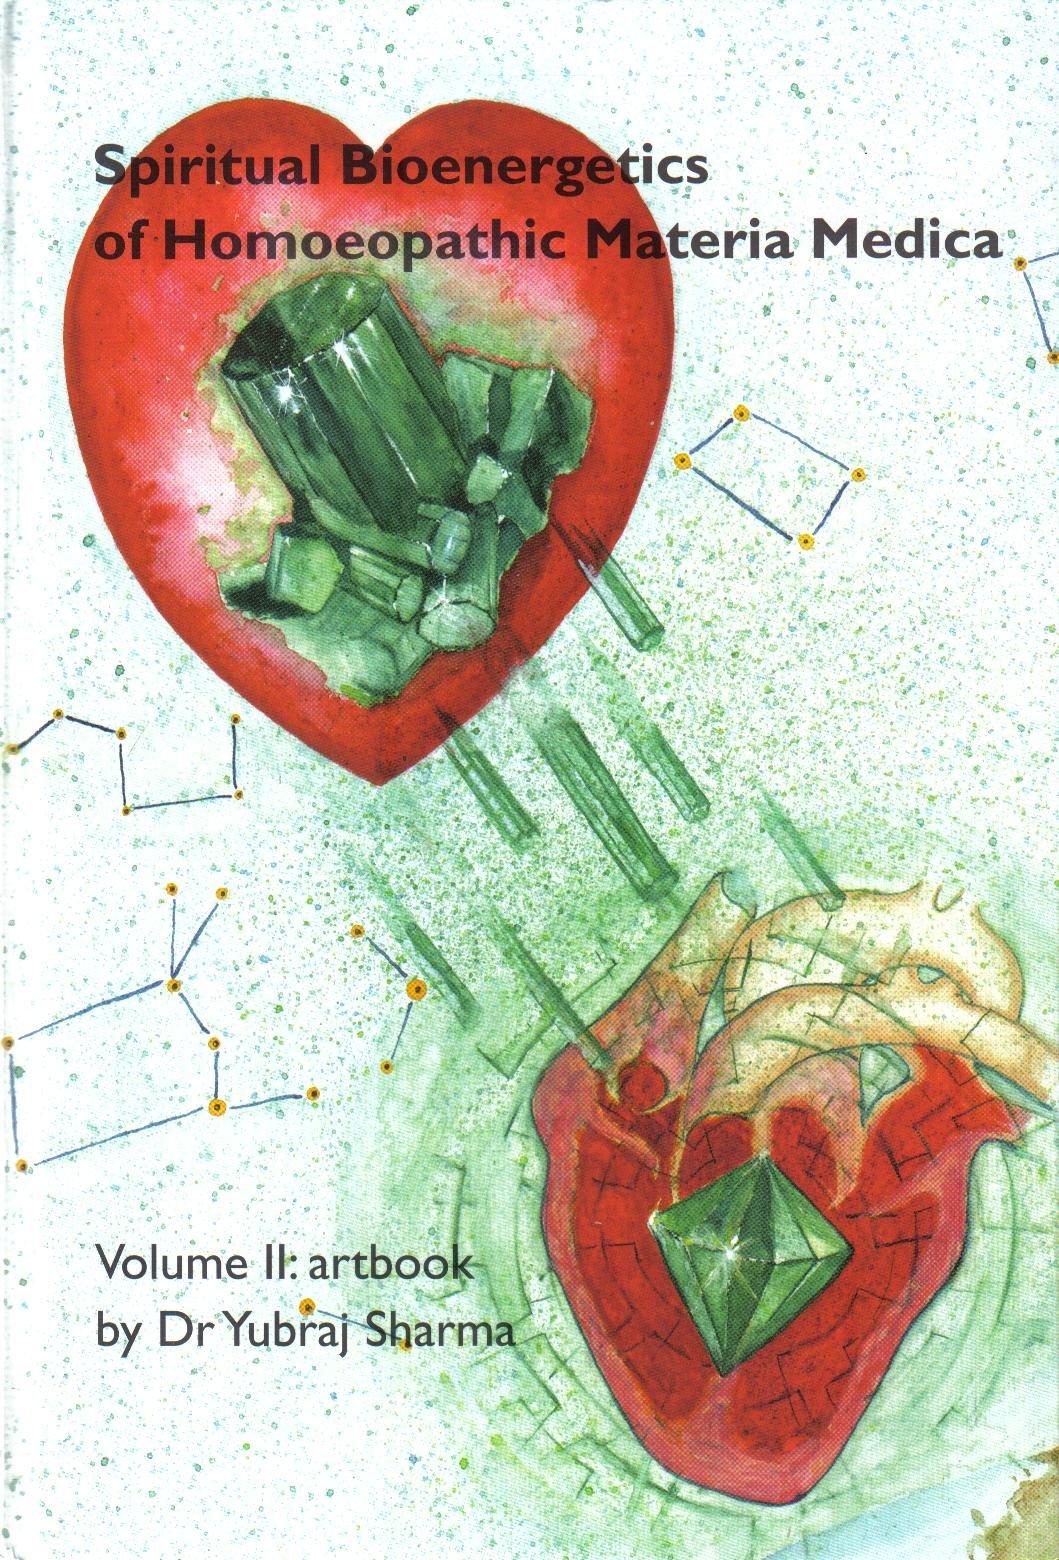 Download Spiritual Bioenergetics of Homoeopathic Materia Medica: Artbook v. 2 ebook